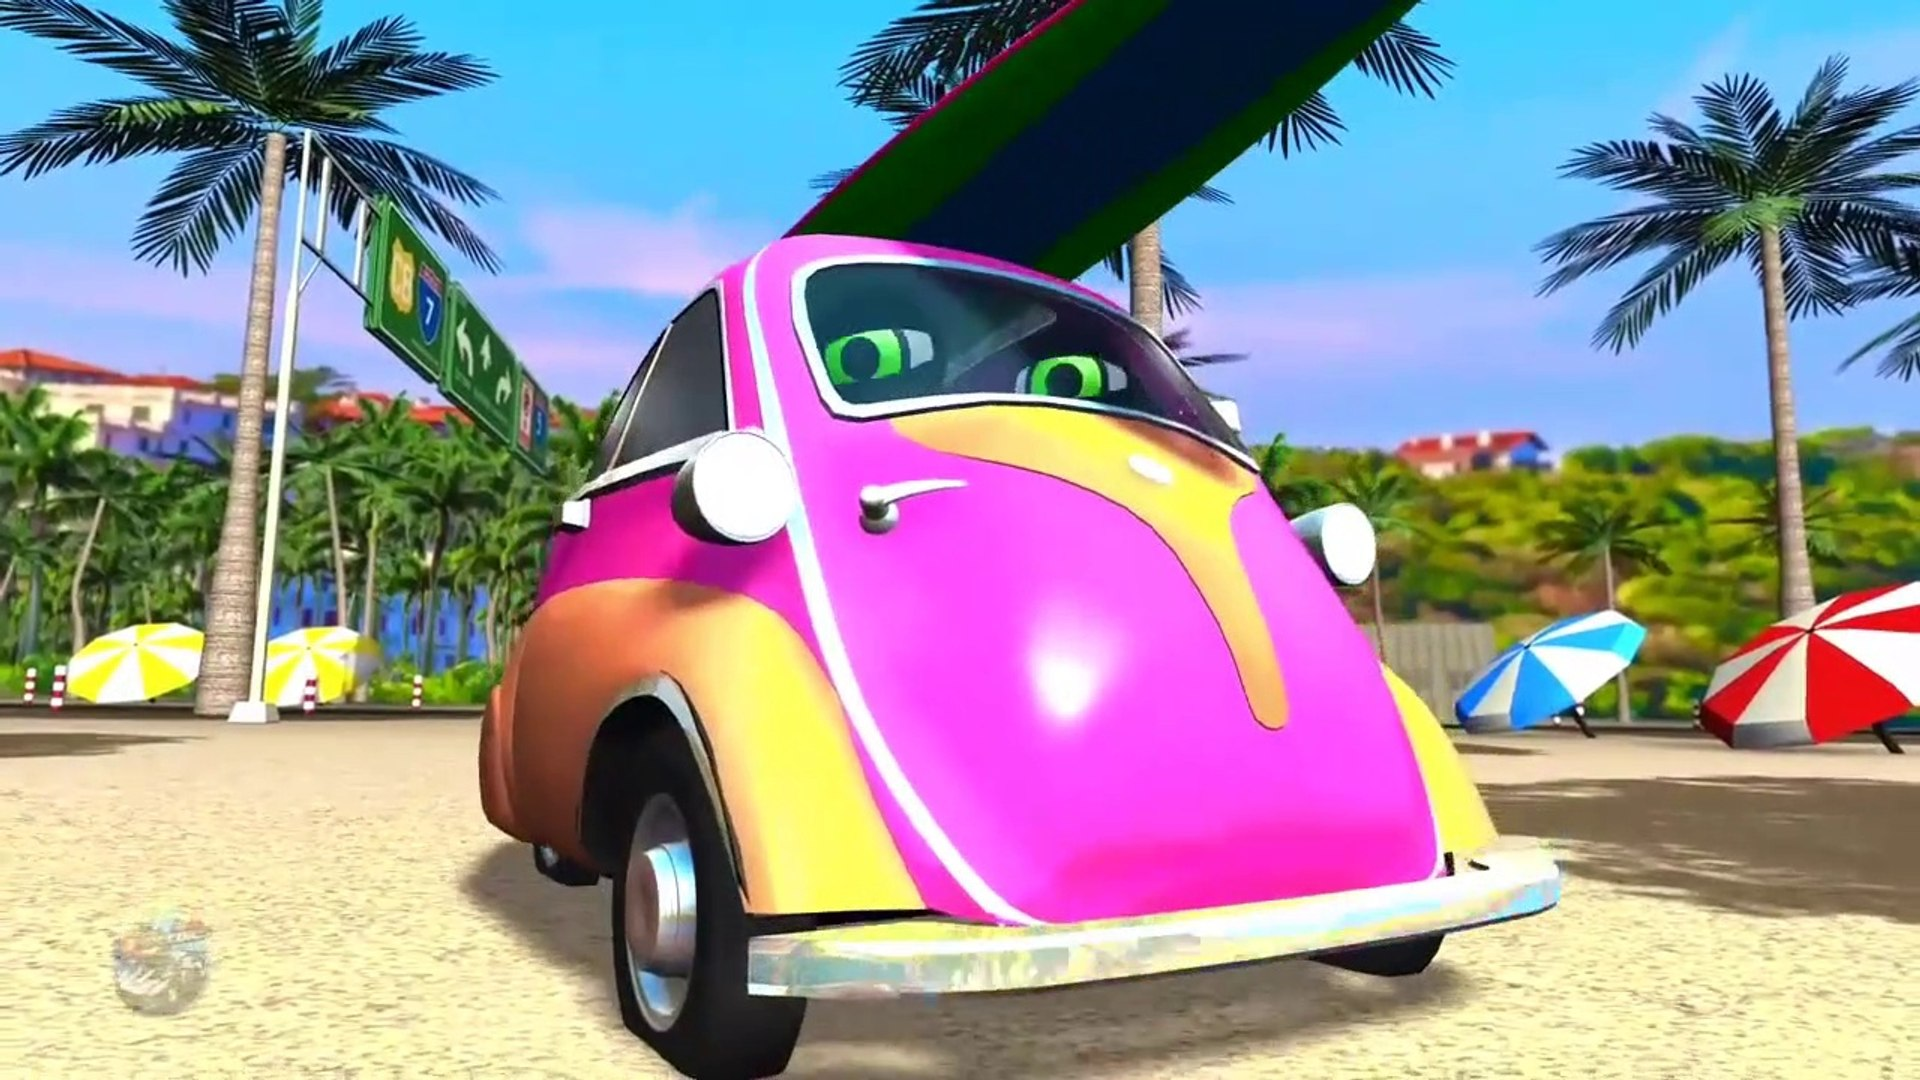 Car Jump And Beautiful Car Model and Beautiful Toy Zip